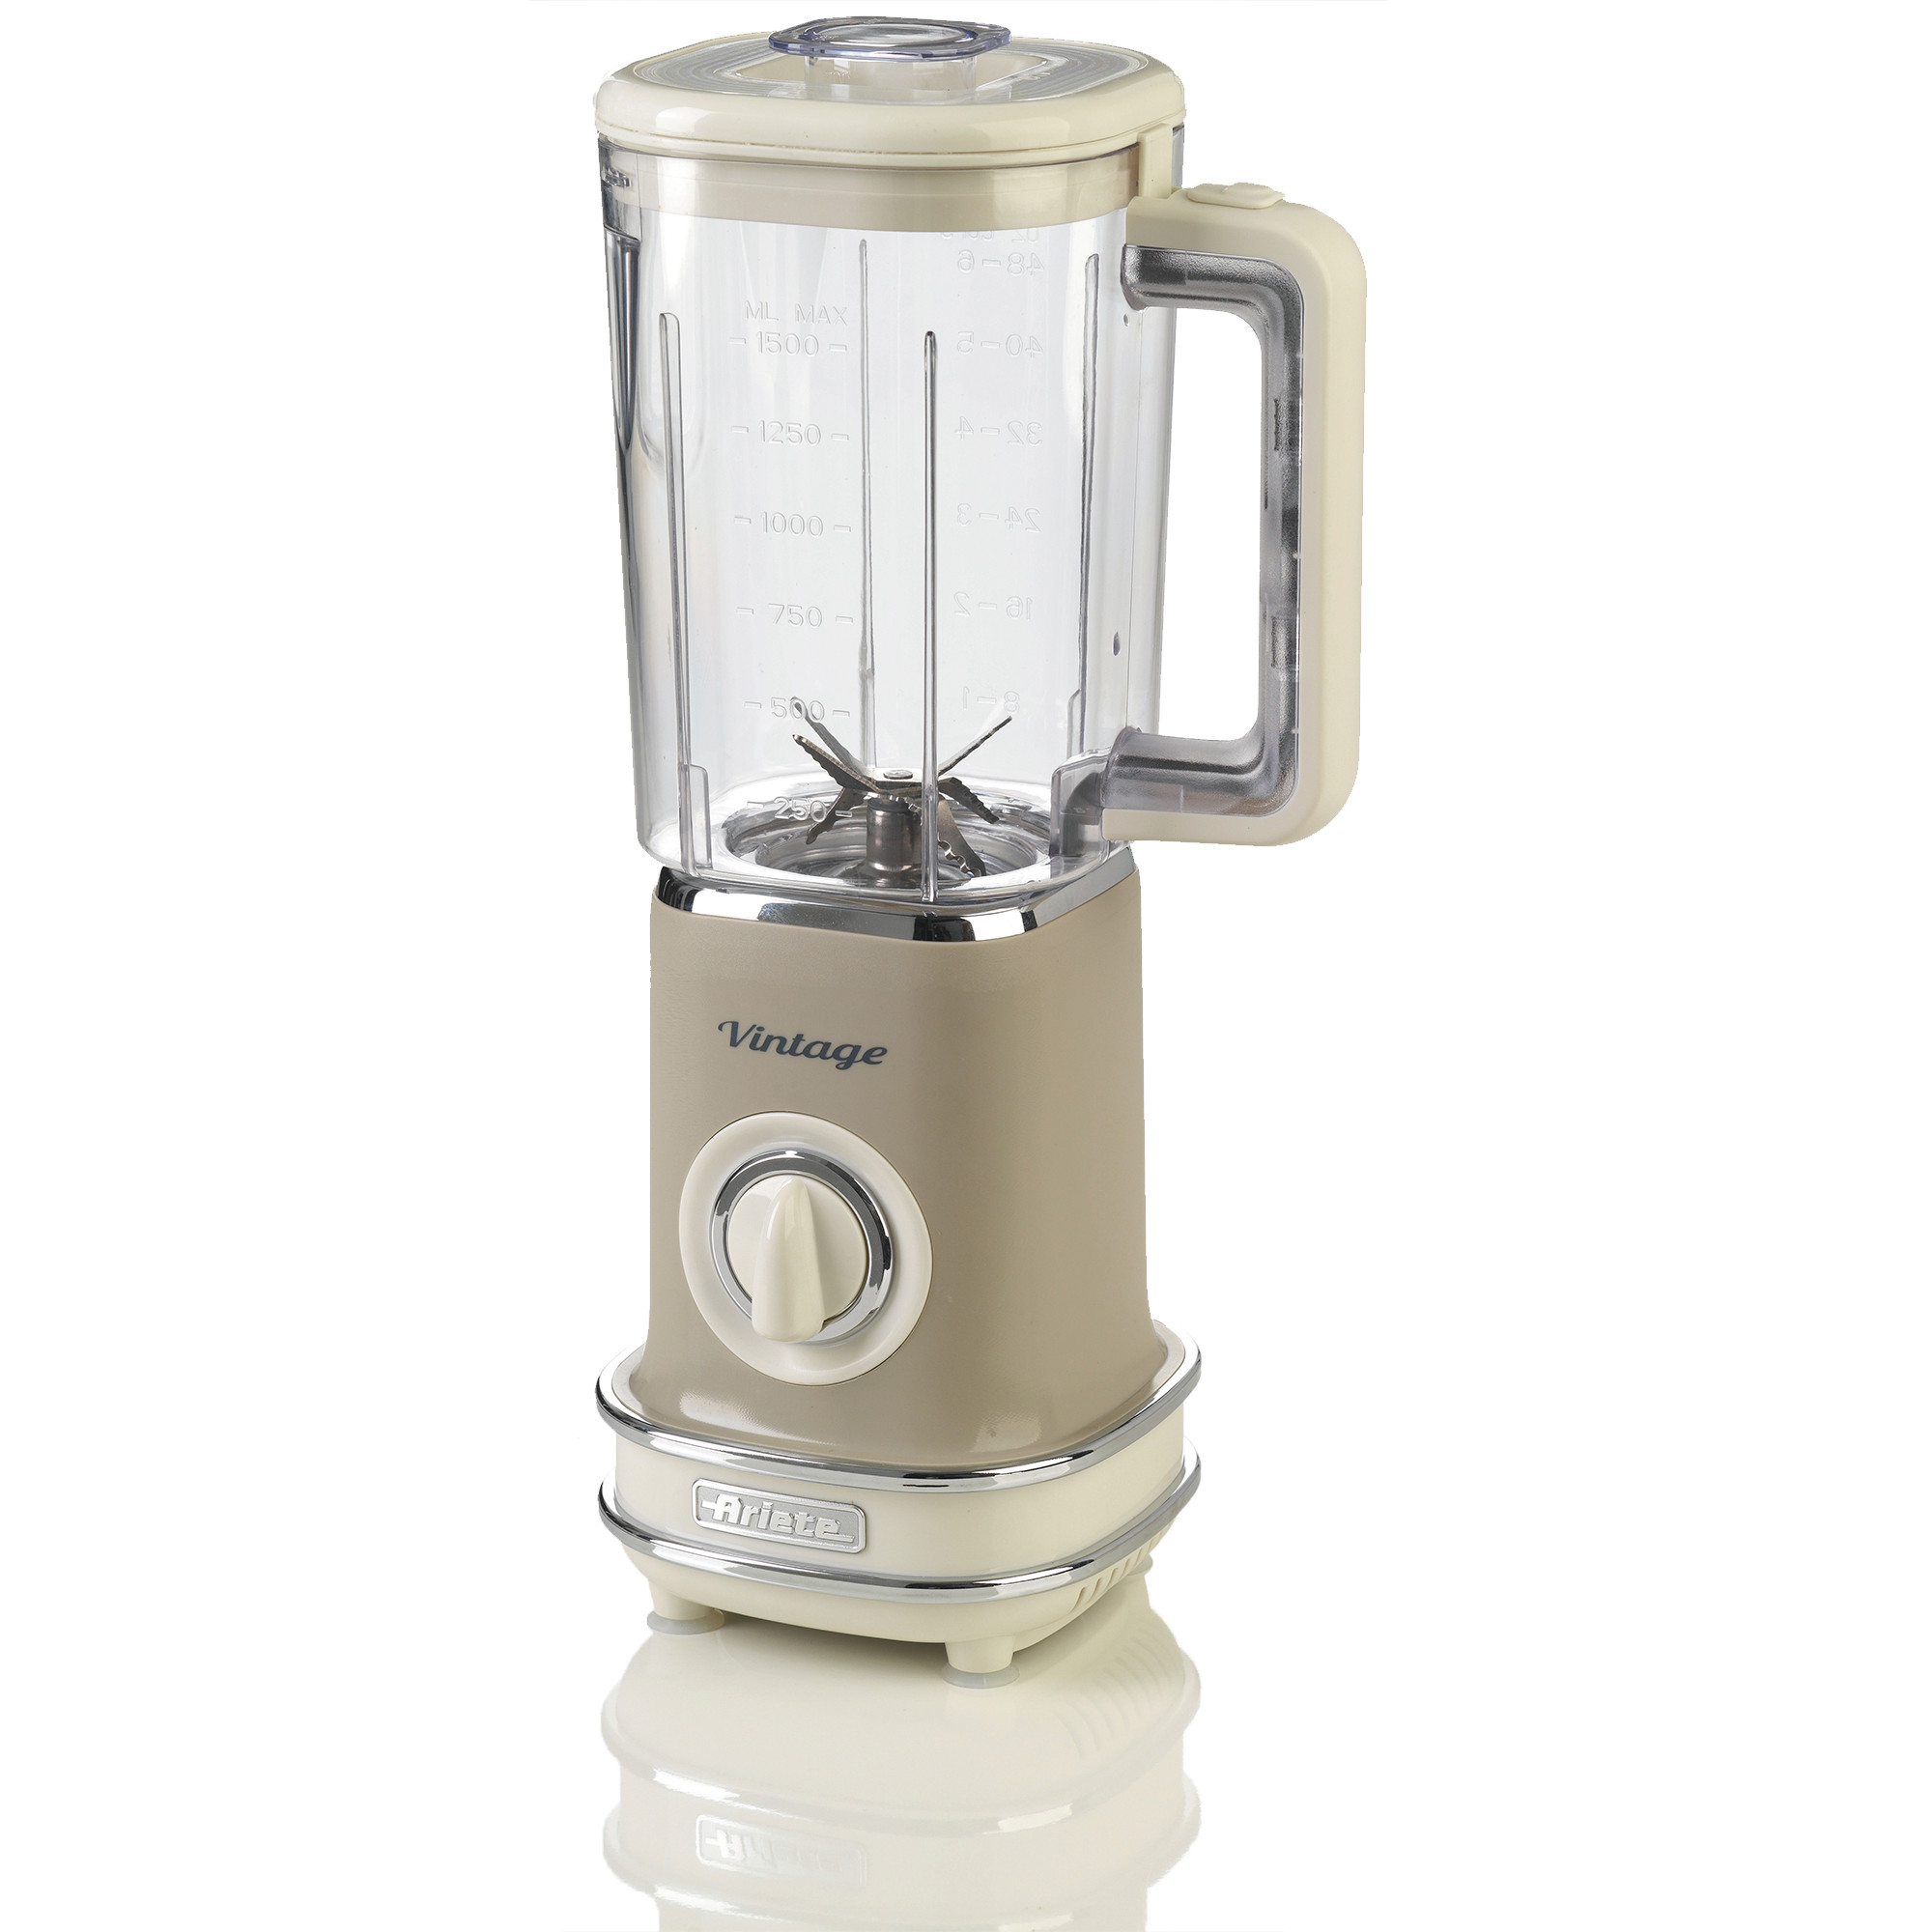 Image of   Ariete Vintage Blender 568, beige